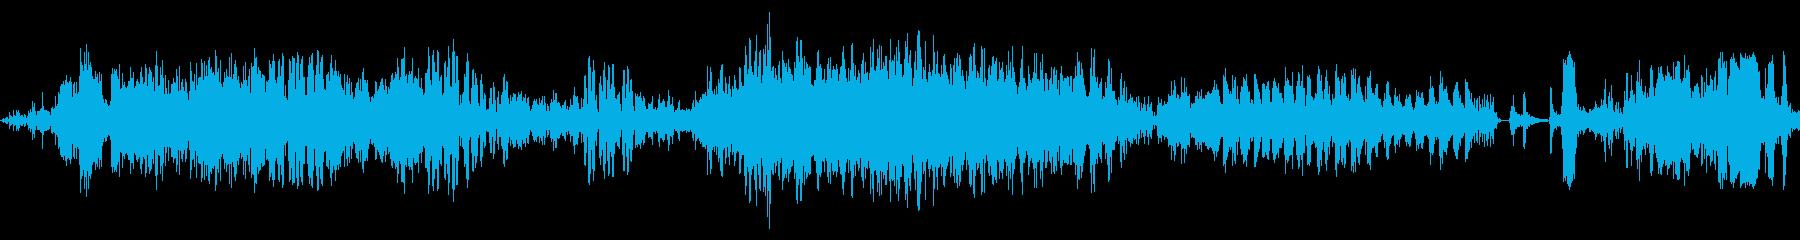 SciFi EC01_83_1の再生済みの波形